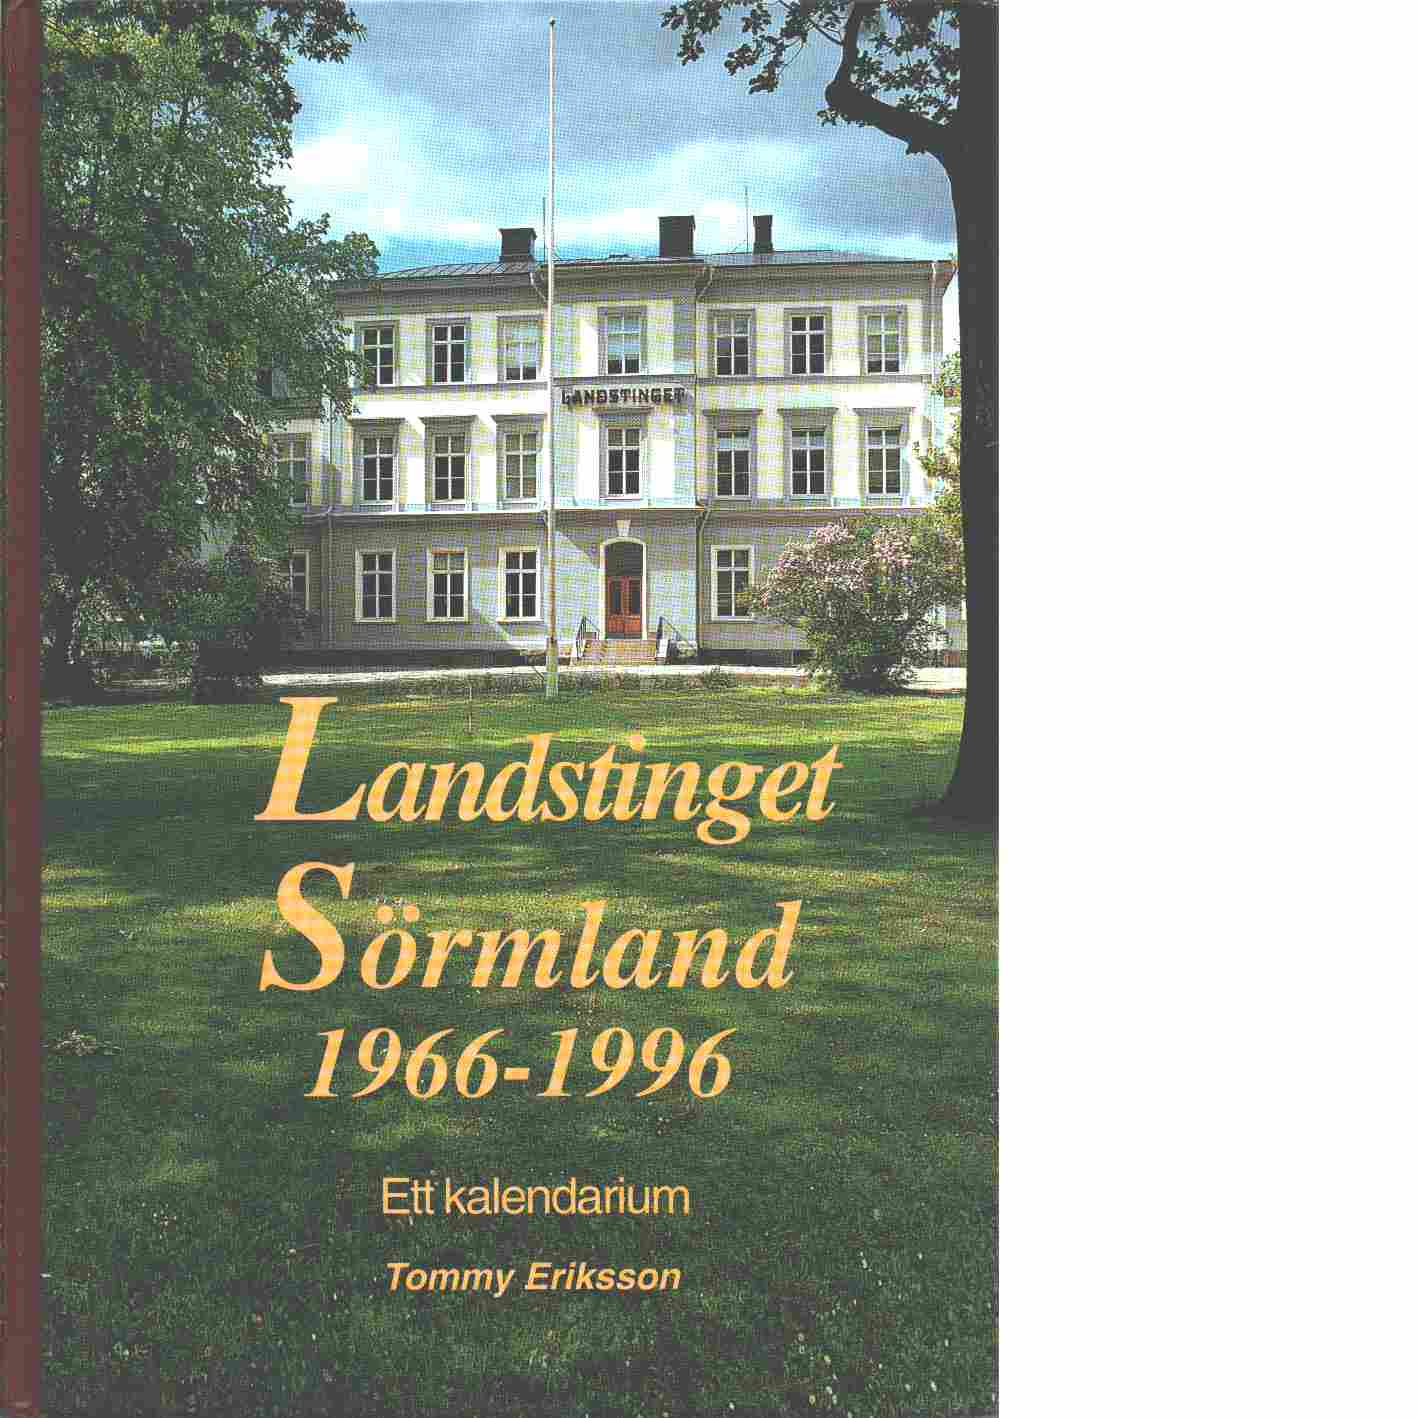 Landstinget Sörmland 1966-1996 : ett kalendarium - Eriksson, Tommy